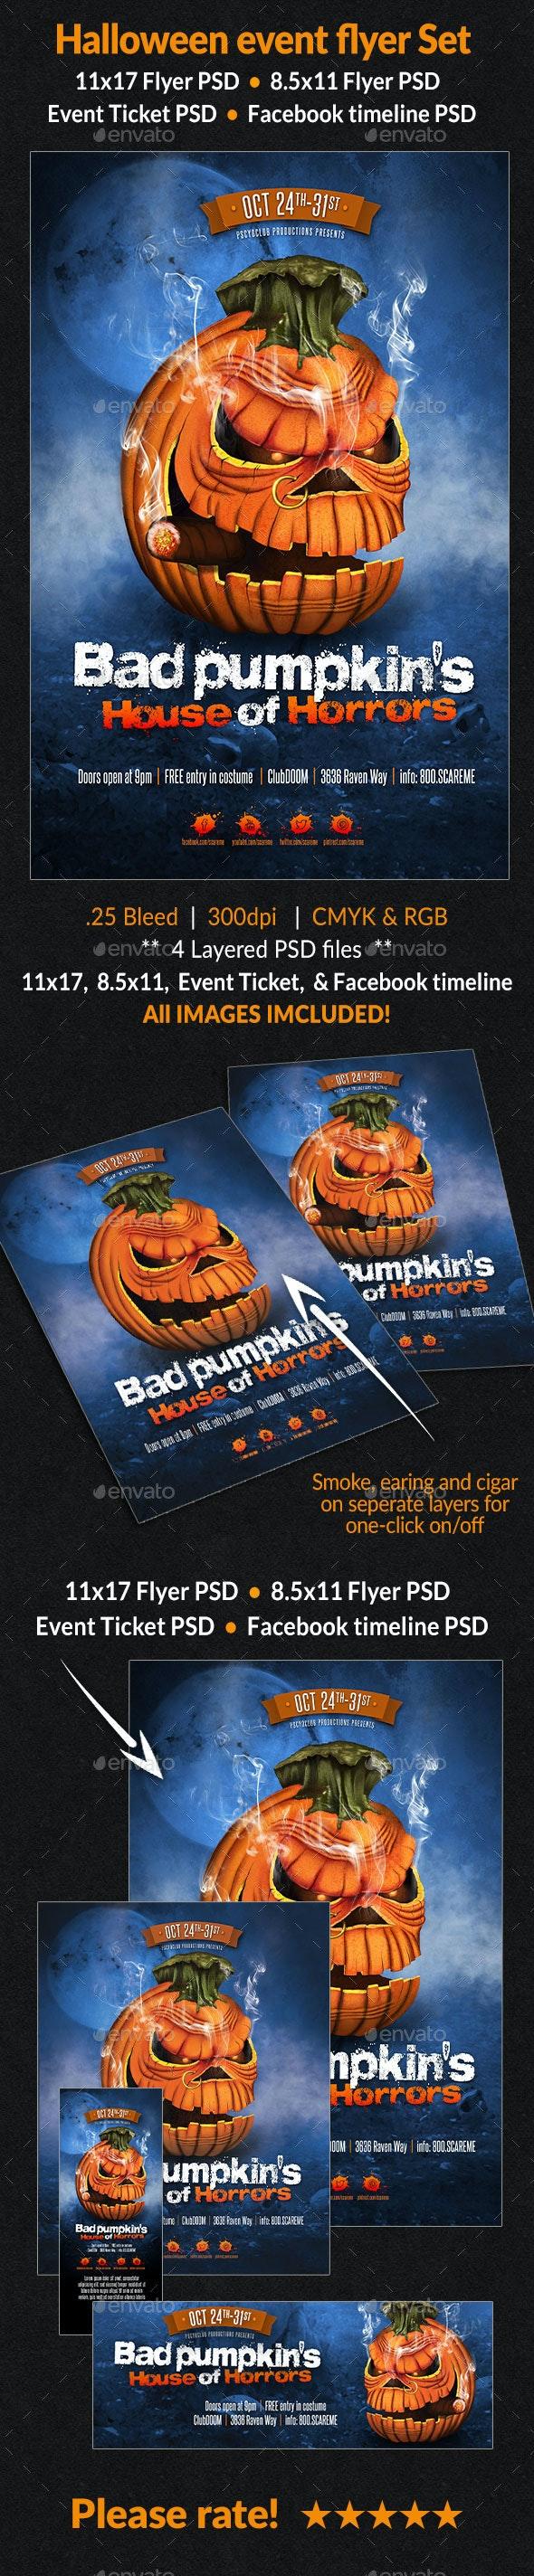 Halloween Event Flyer Set - Events Flyers